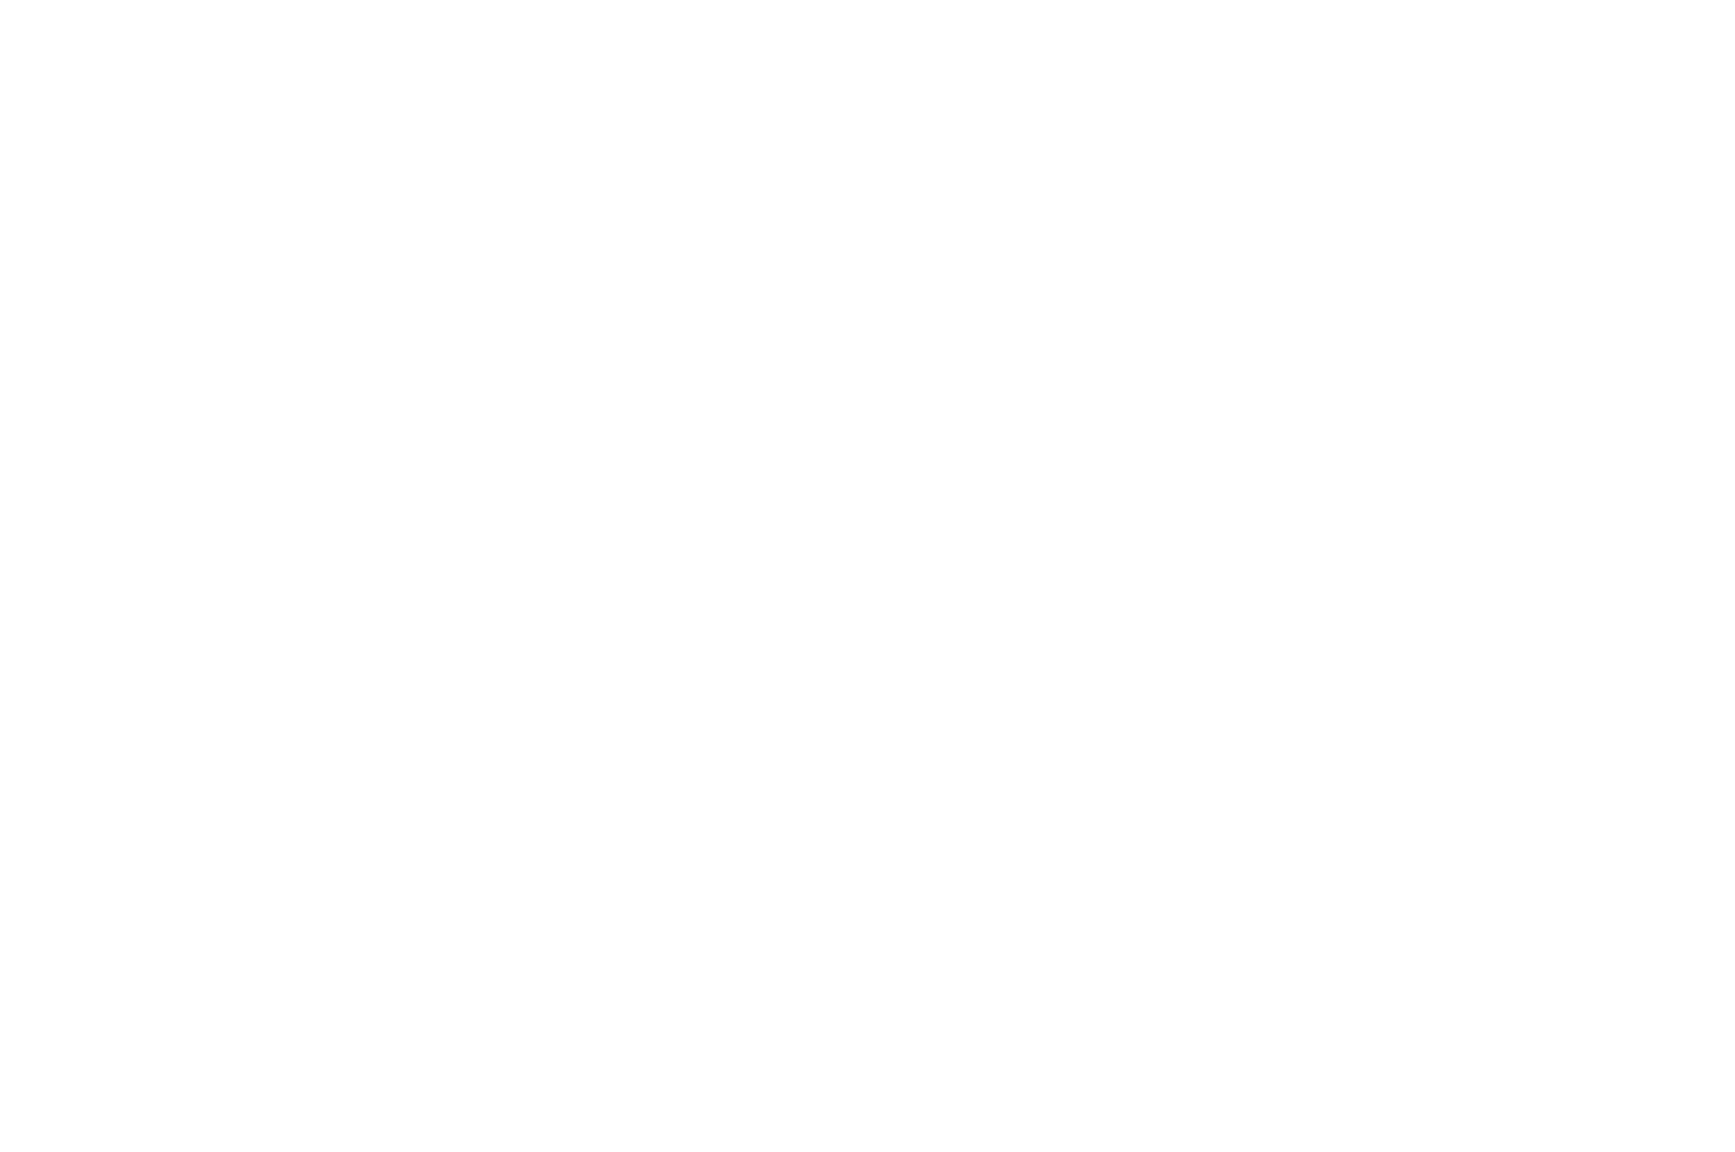 QUARTER-FINALIST - WriteMovies International Writing Contest